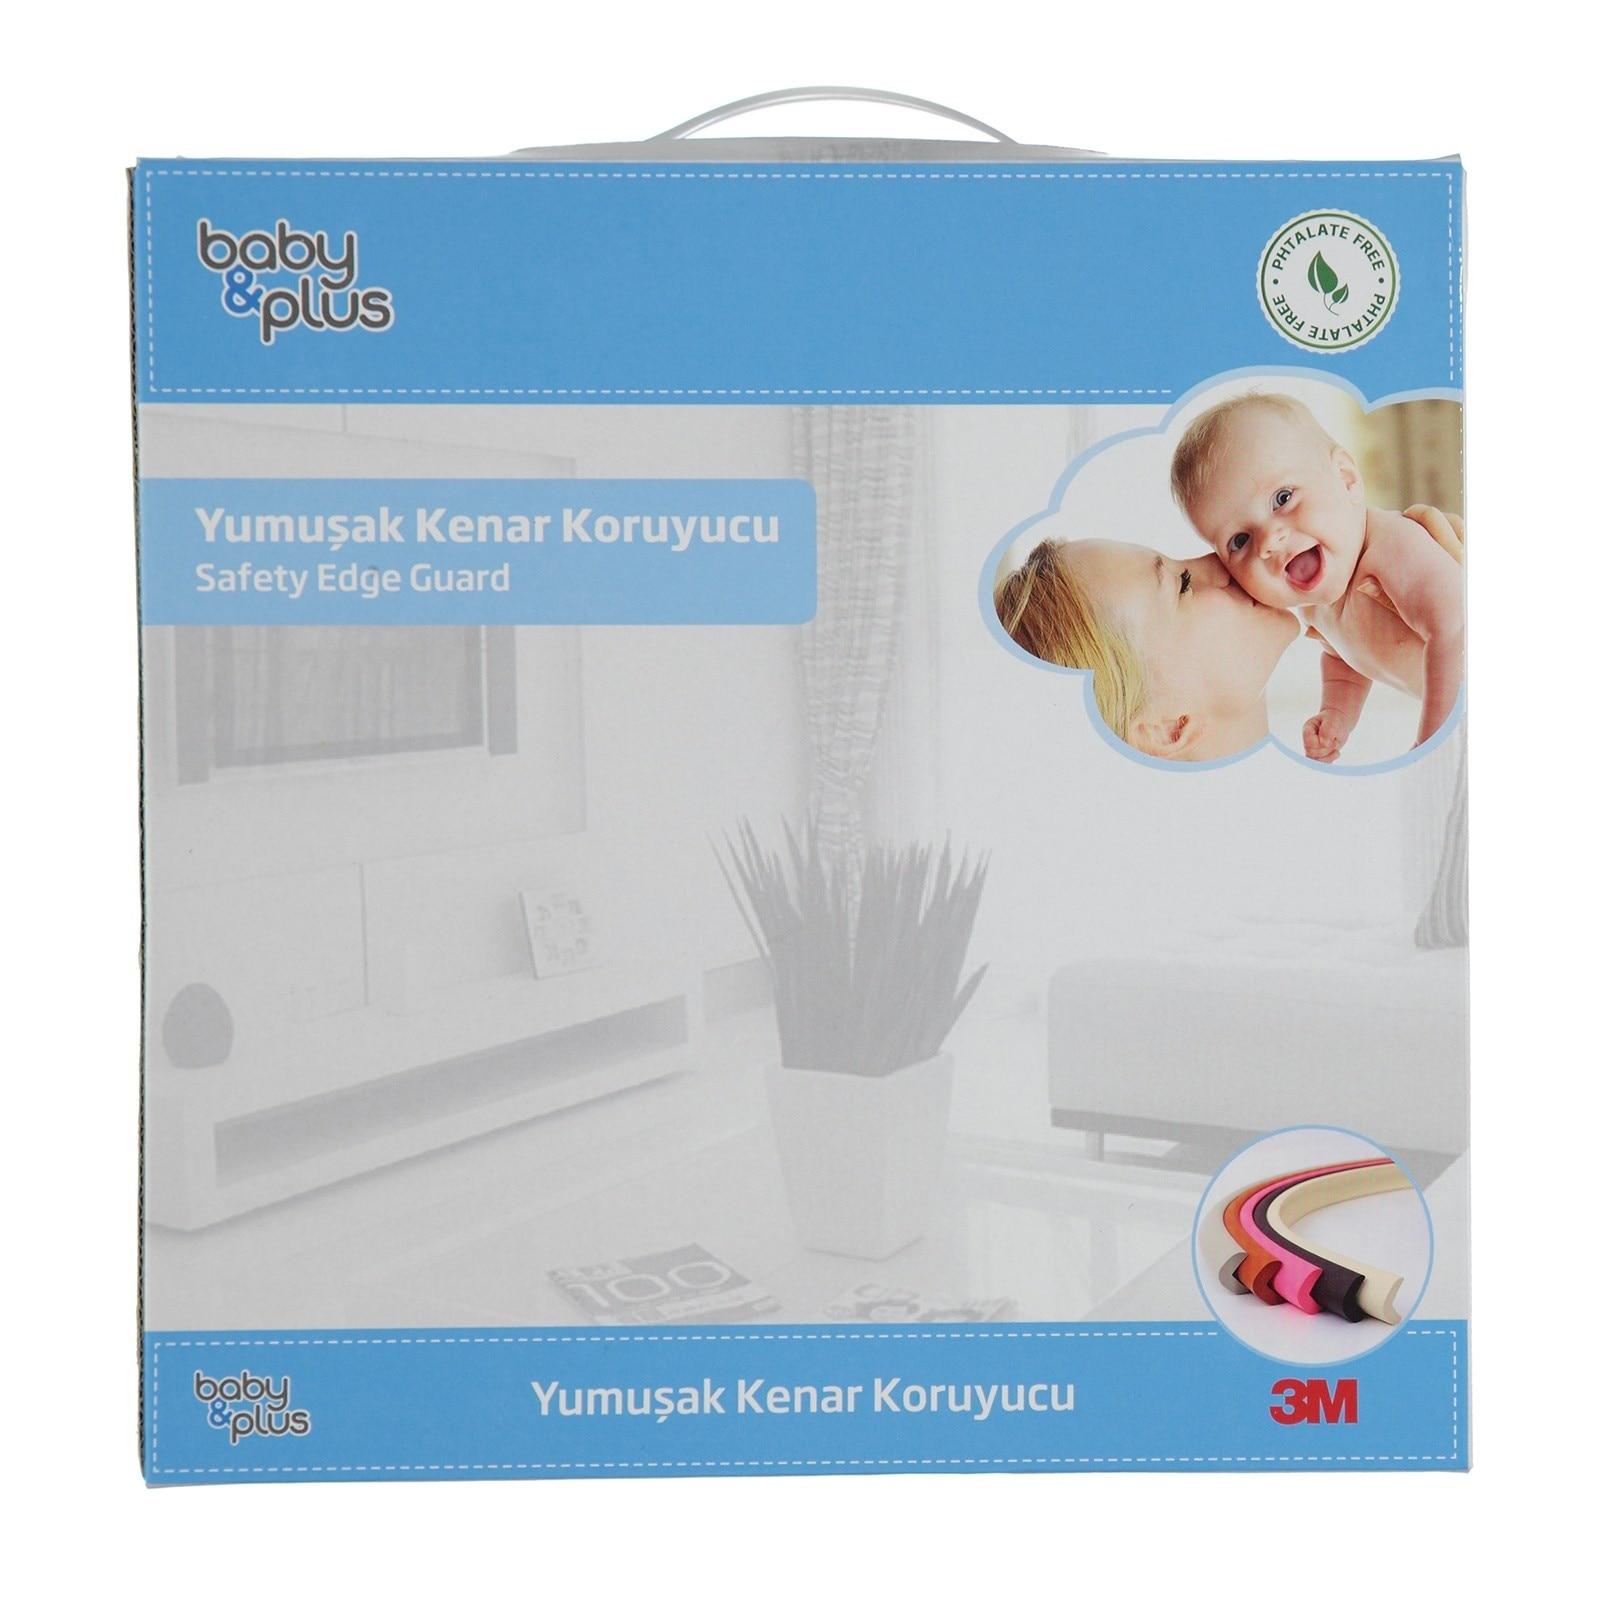 Ebebek Baby&plus Soft Safety Edge Guard 23x23x20 Cm